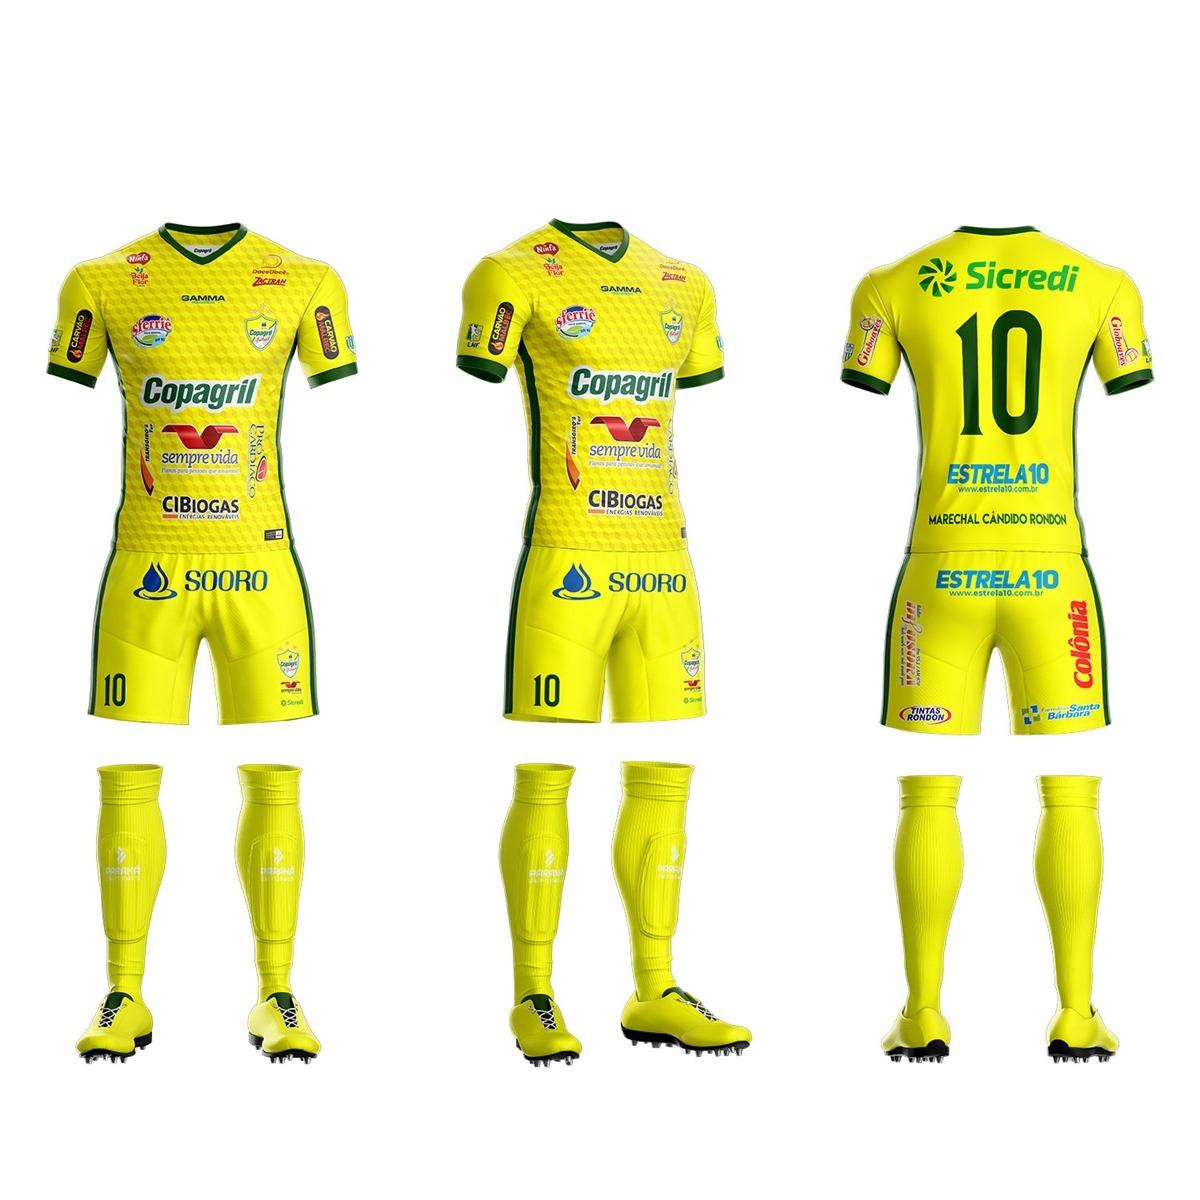 camisa oficial copagril futsal 2018 amarela. Carregando zoom. 8bcc32cb3c123